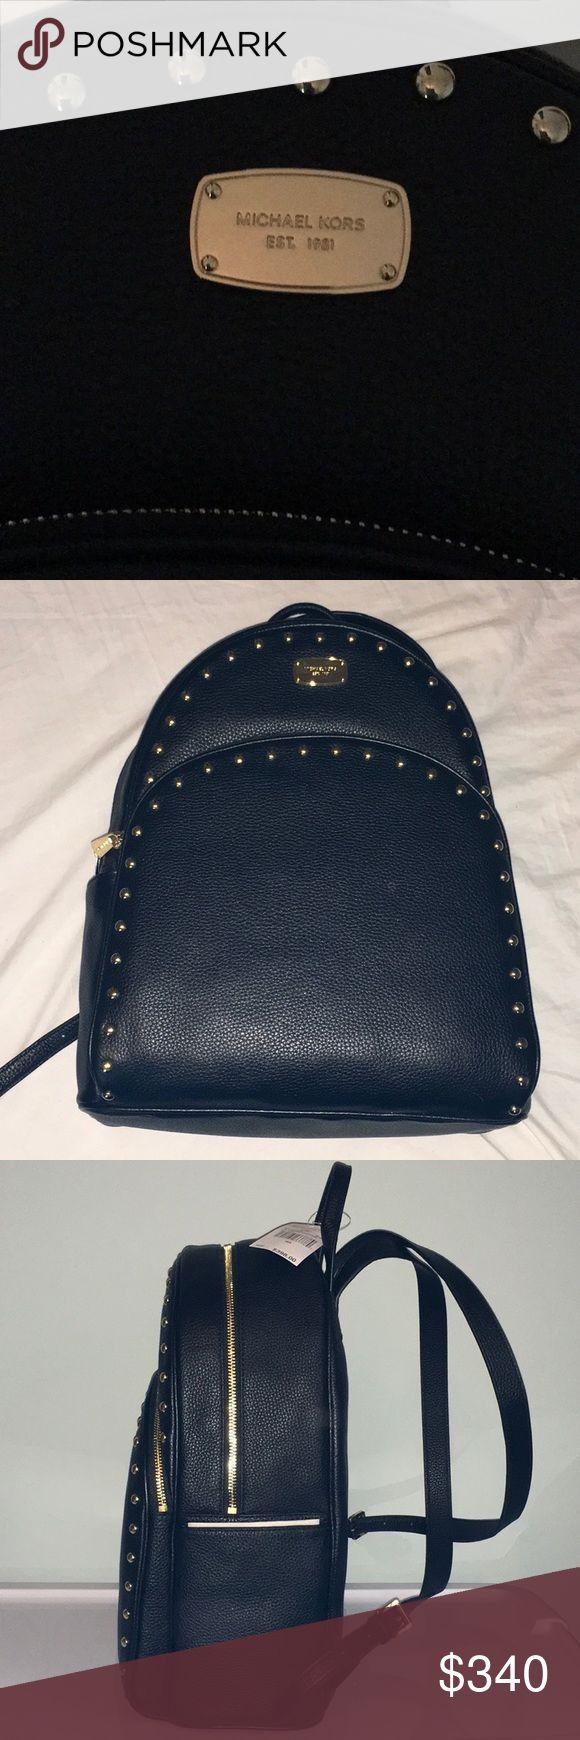 BRAND NEW MICHAEL KOHRS LEATHER BACKPACK *****BRAND NEW***** Michael Kohrs Black Leather Gold Studded  Backpack Michael Kors Bags Shoulder Bags